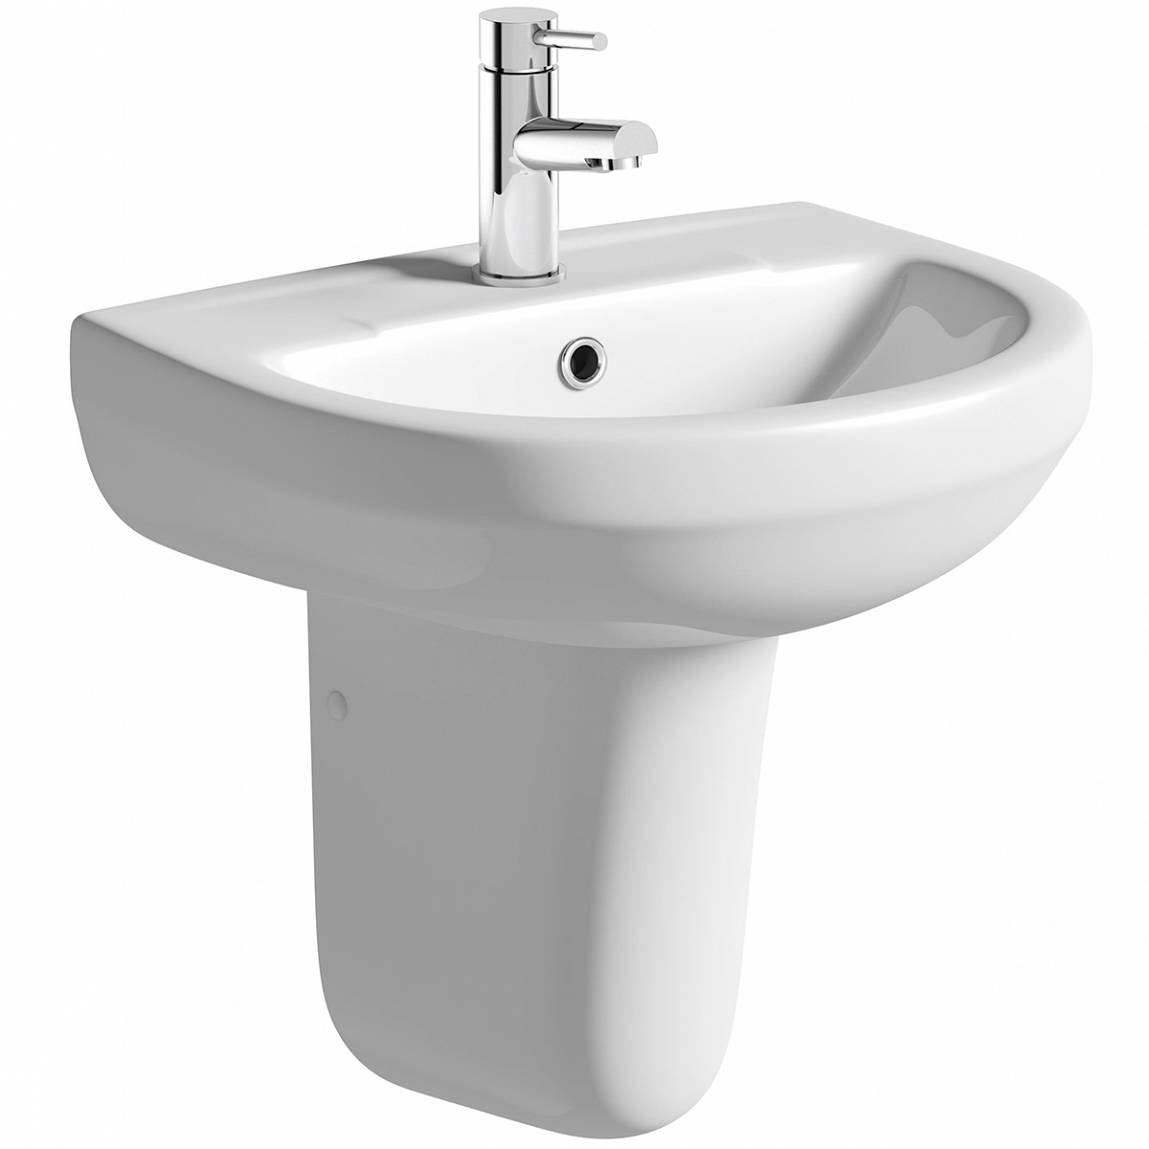 Orchard Eden 1 tap hole semi pedestal basin 550mm